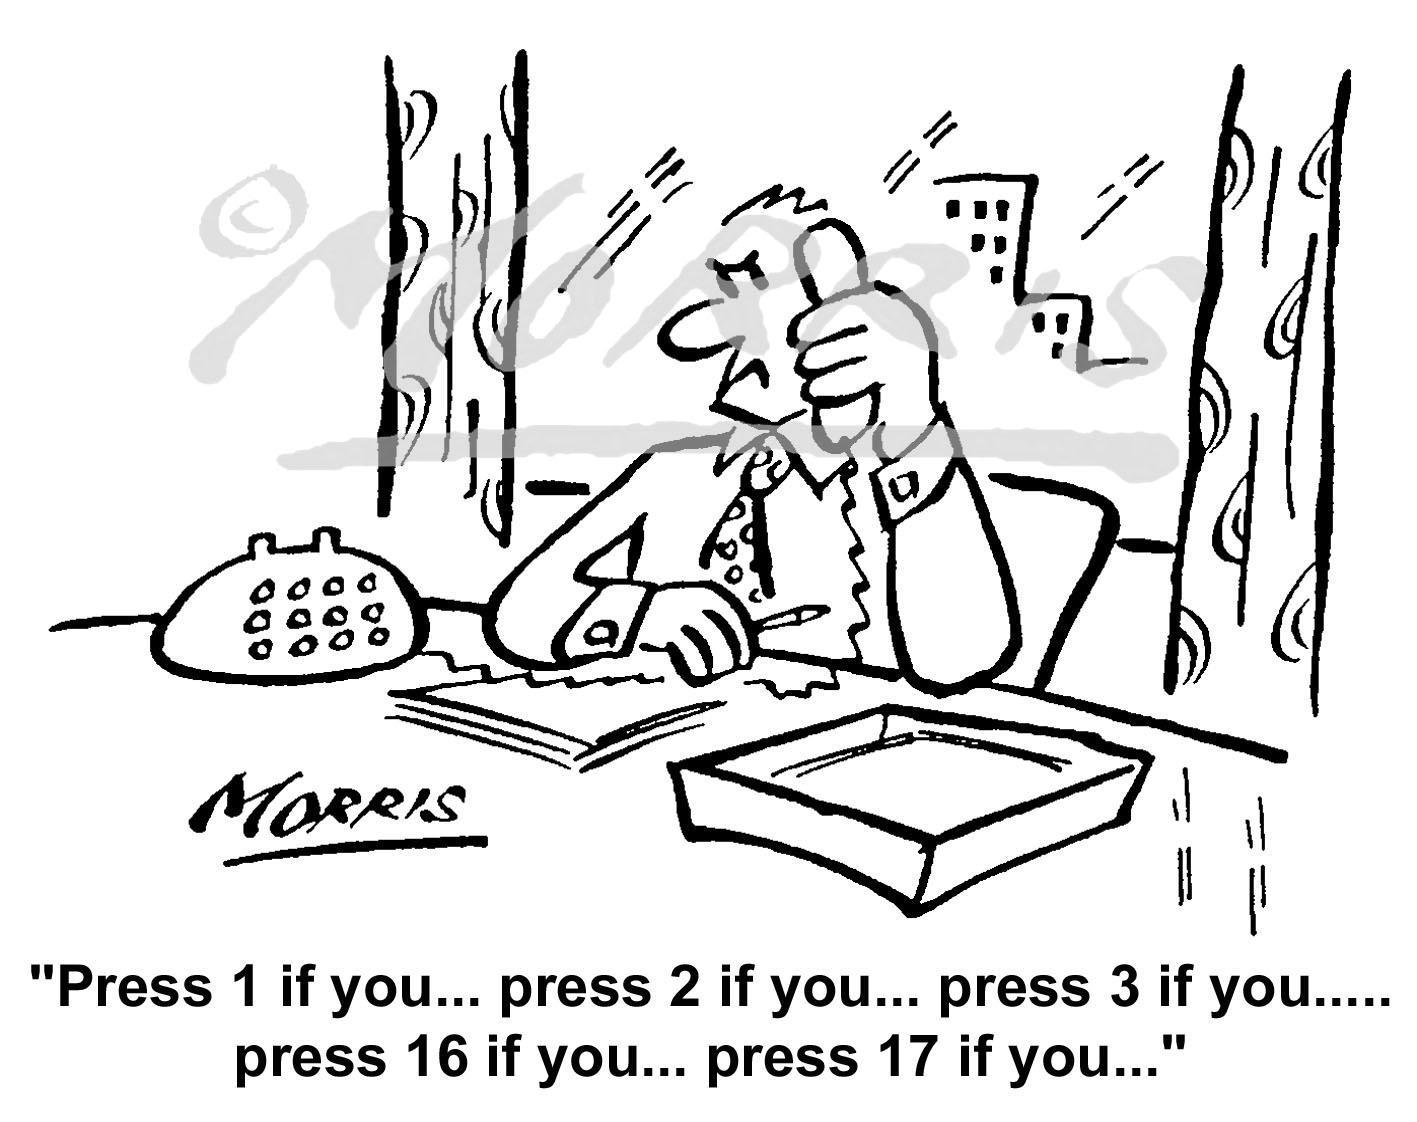 Customer service cartoon, Telephone cartoon – Ref: 6200bw